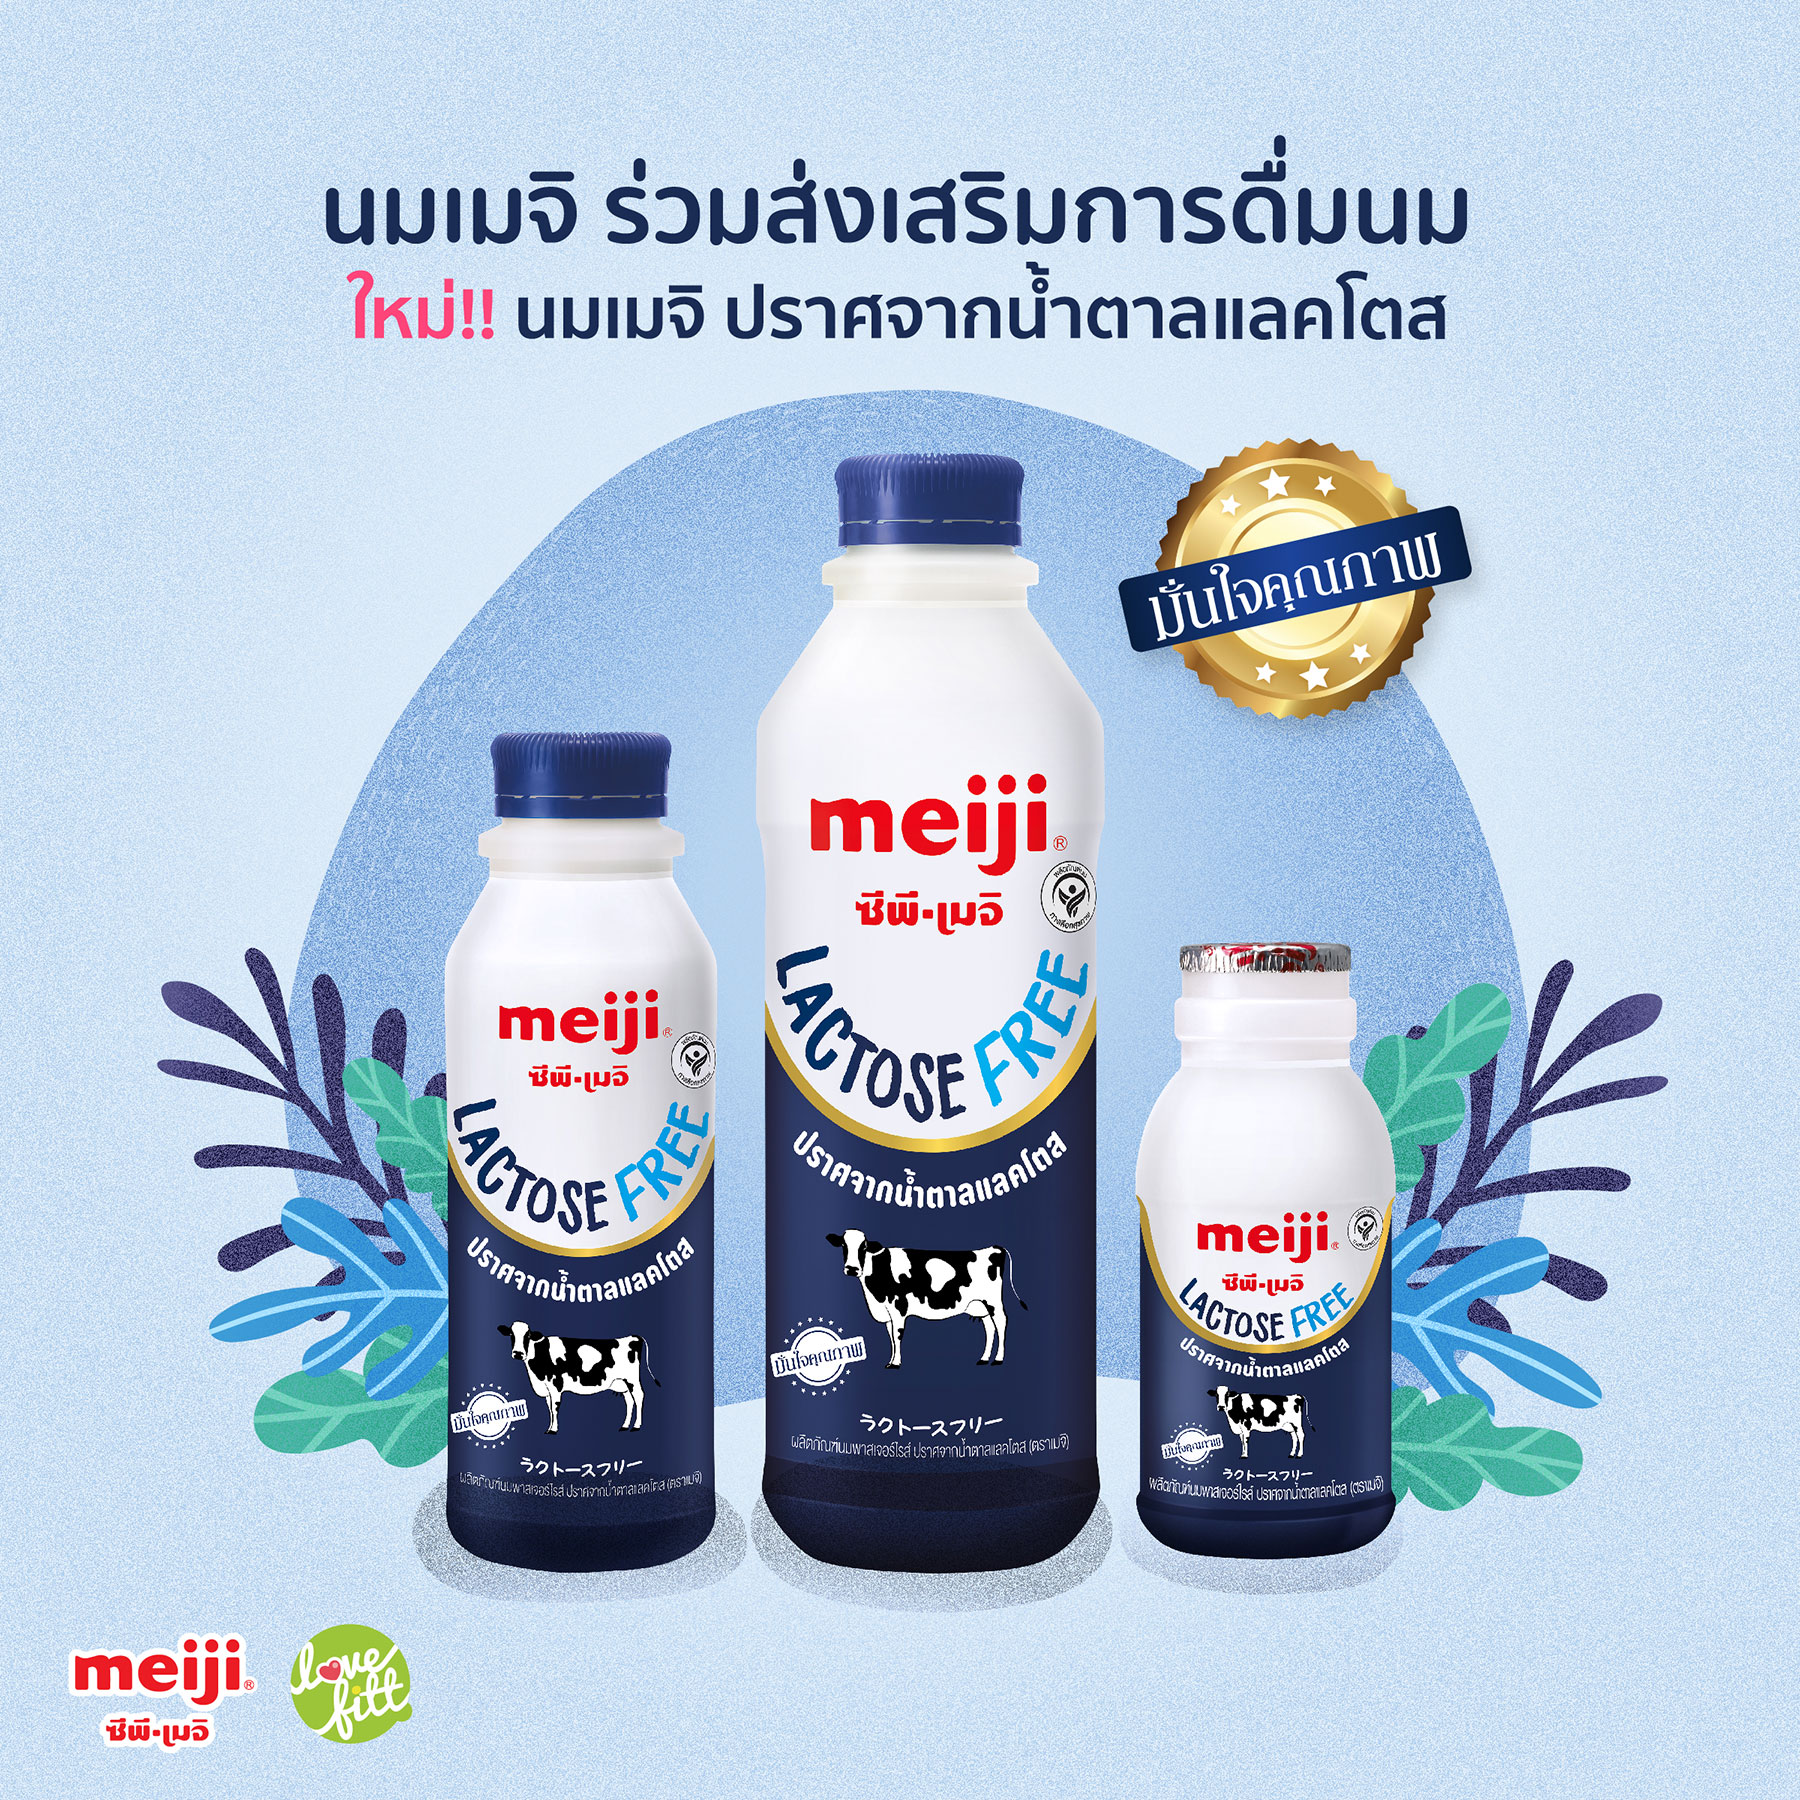 meiji-lactose-free-milk-img-08